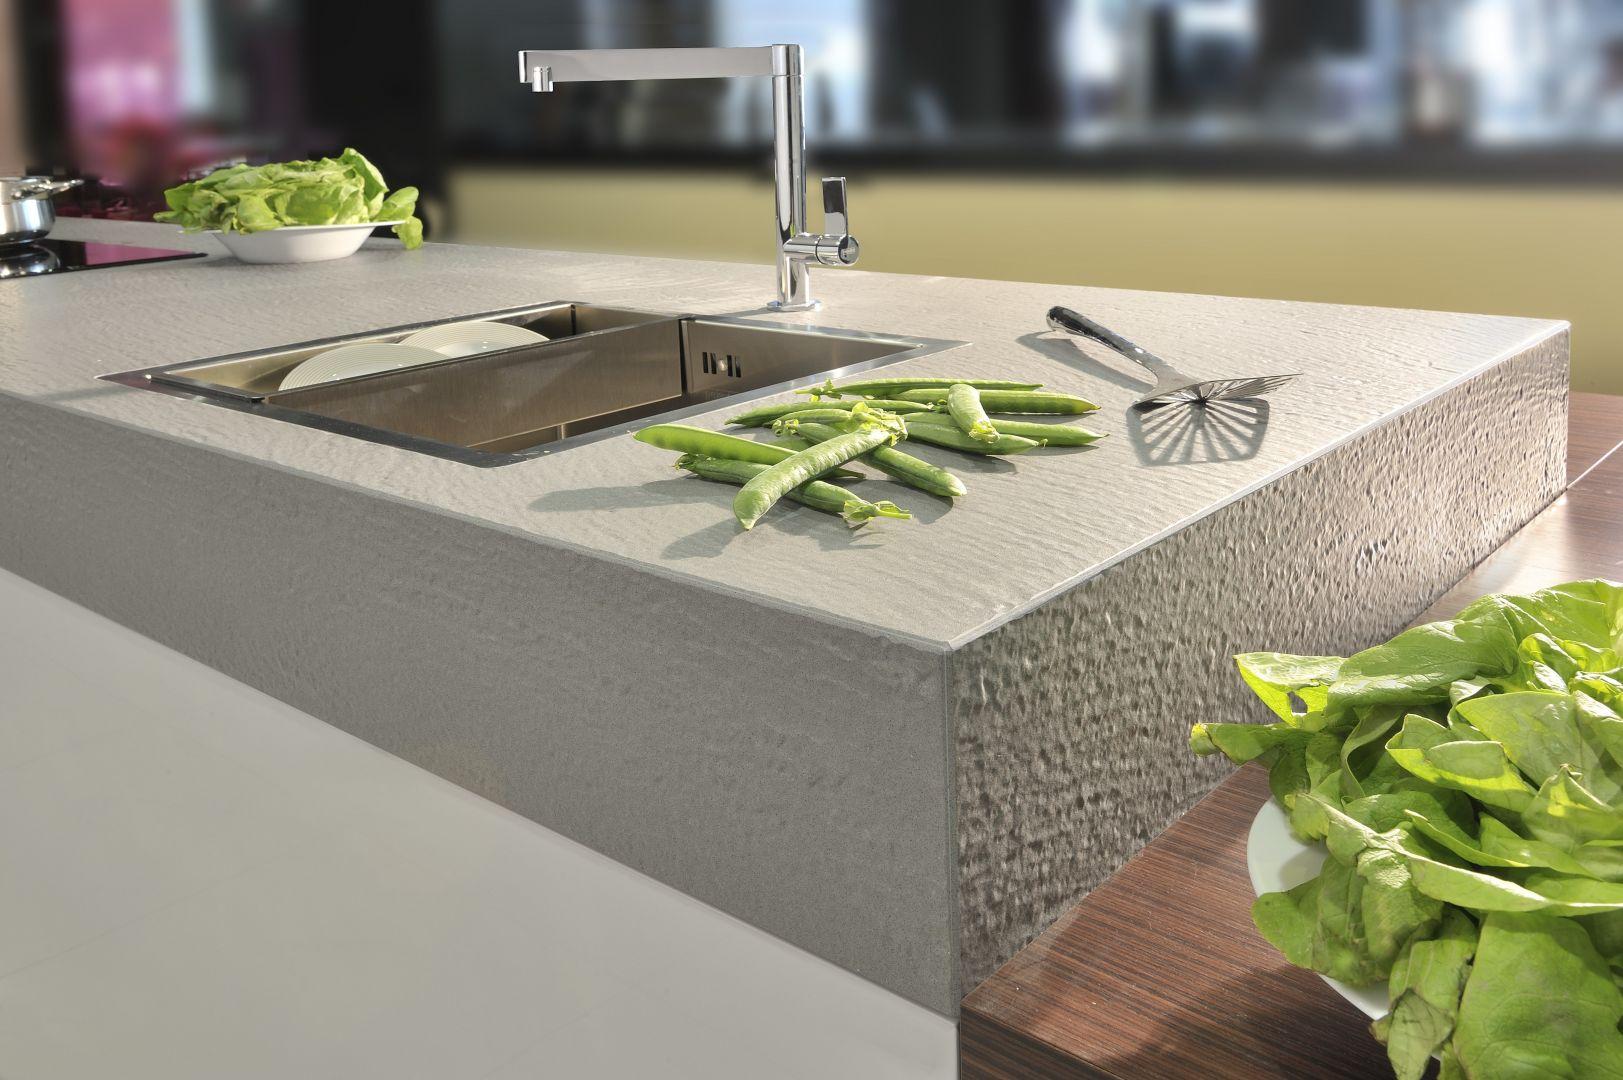 Blat kuchenny Crystal Royal wykonany z materiału kompozytowego. Fot. Technistone